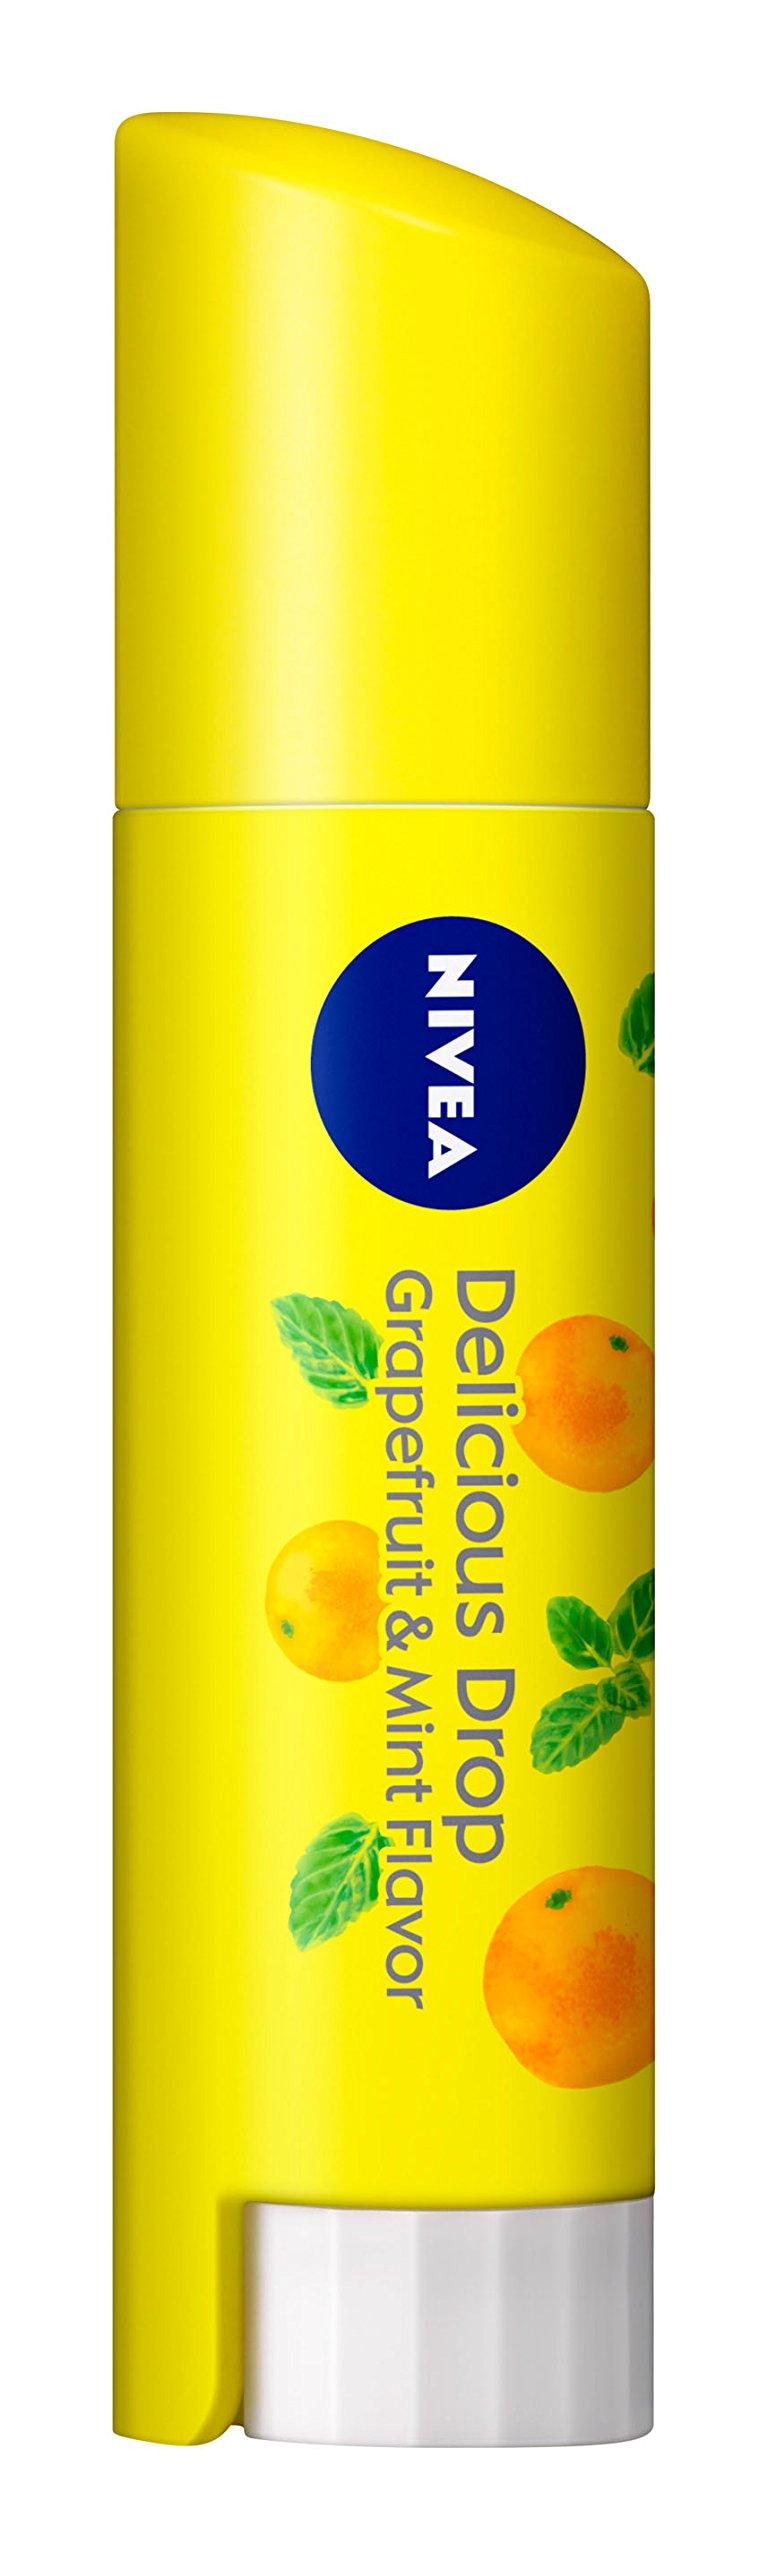 Nivea JAPAN Scent 3.5g of Nivea flavor lip delicious drop grapefruit